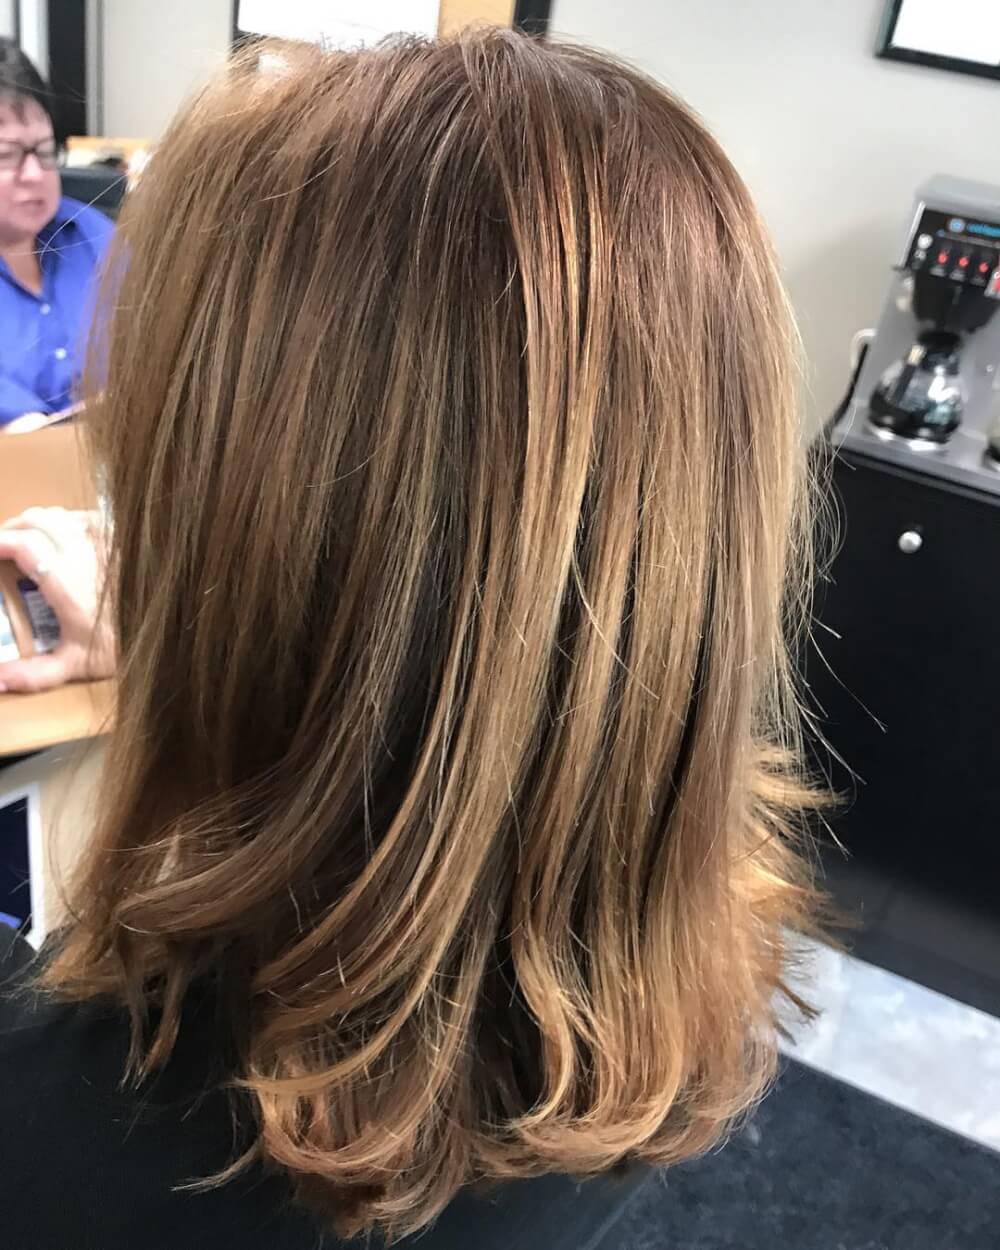 Warm & Layered hairstyle